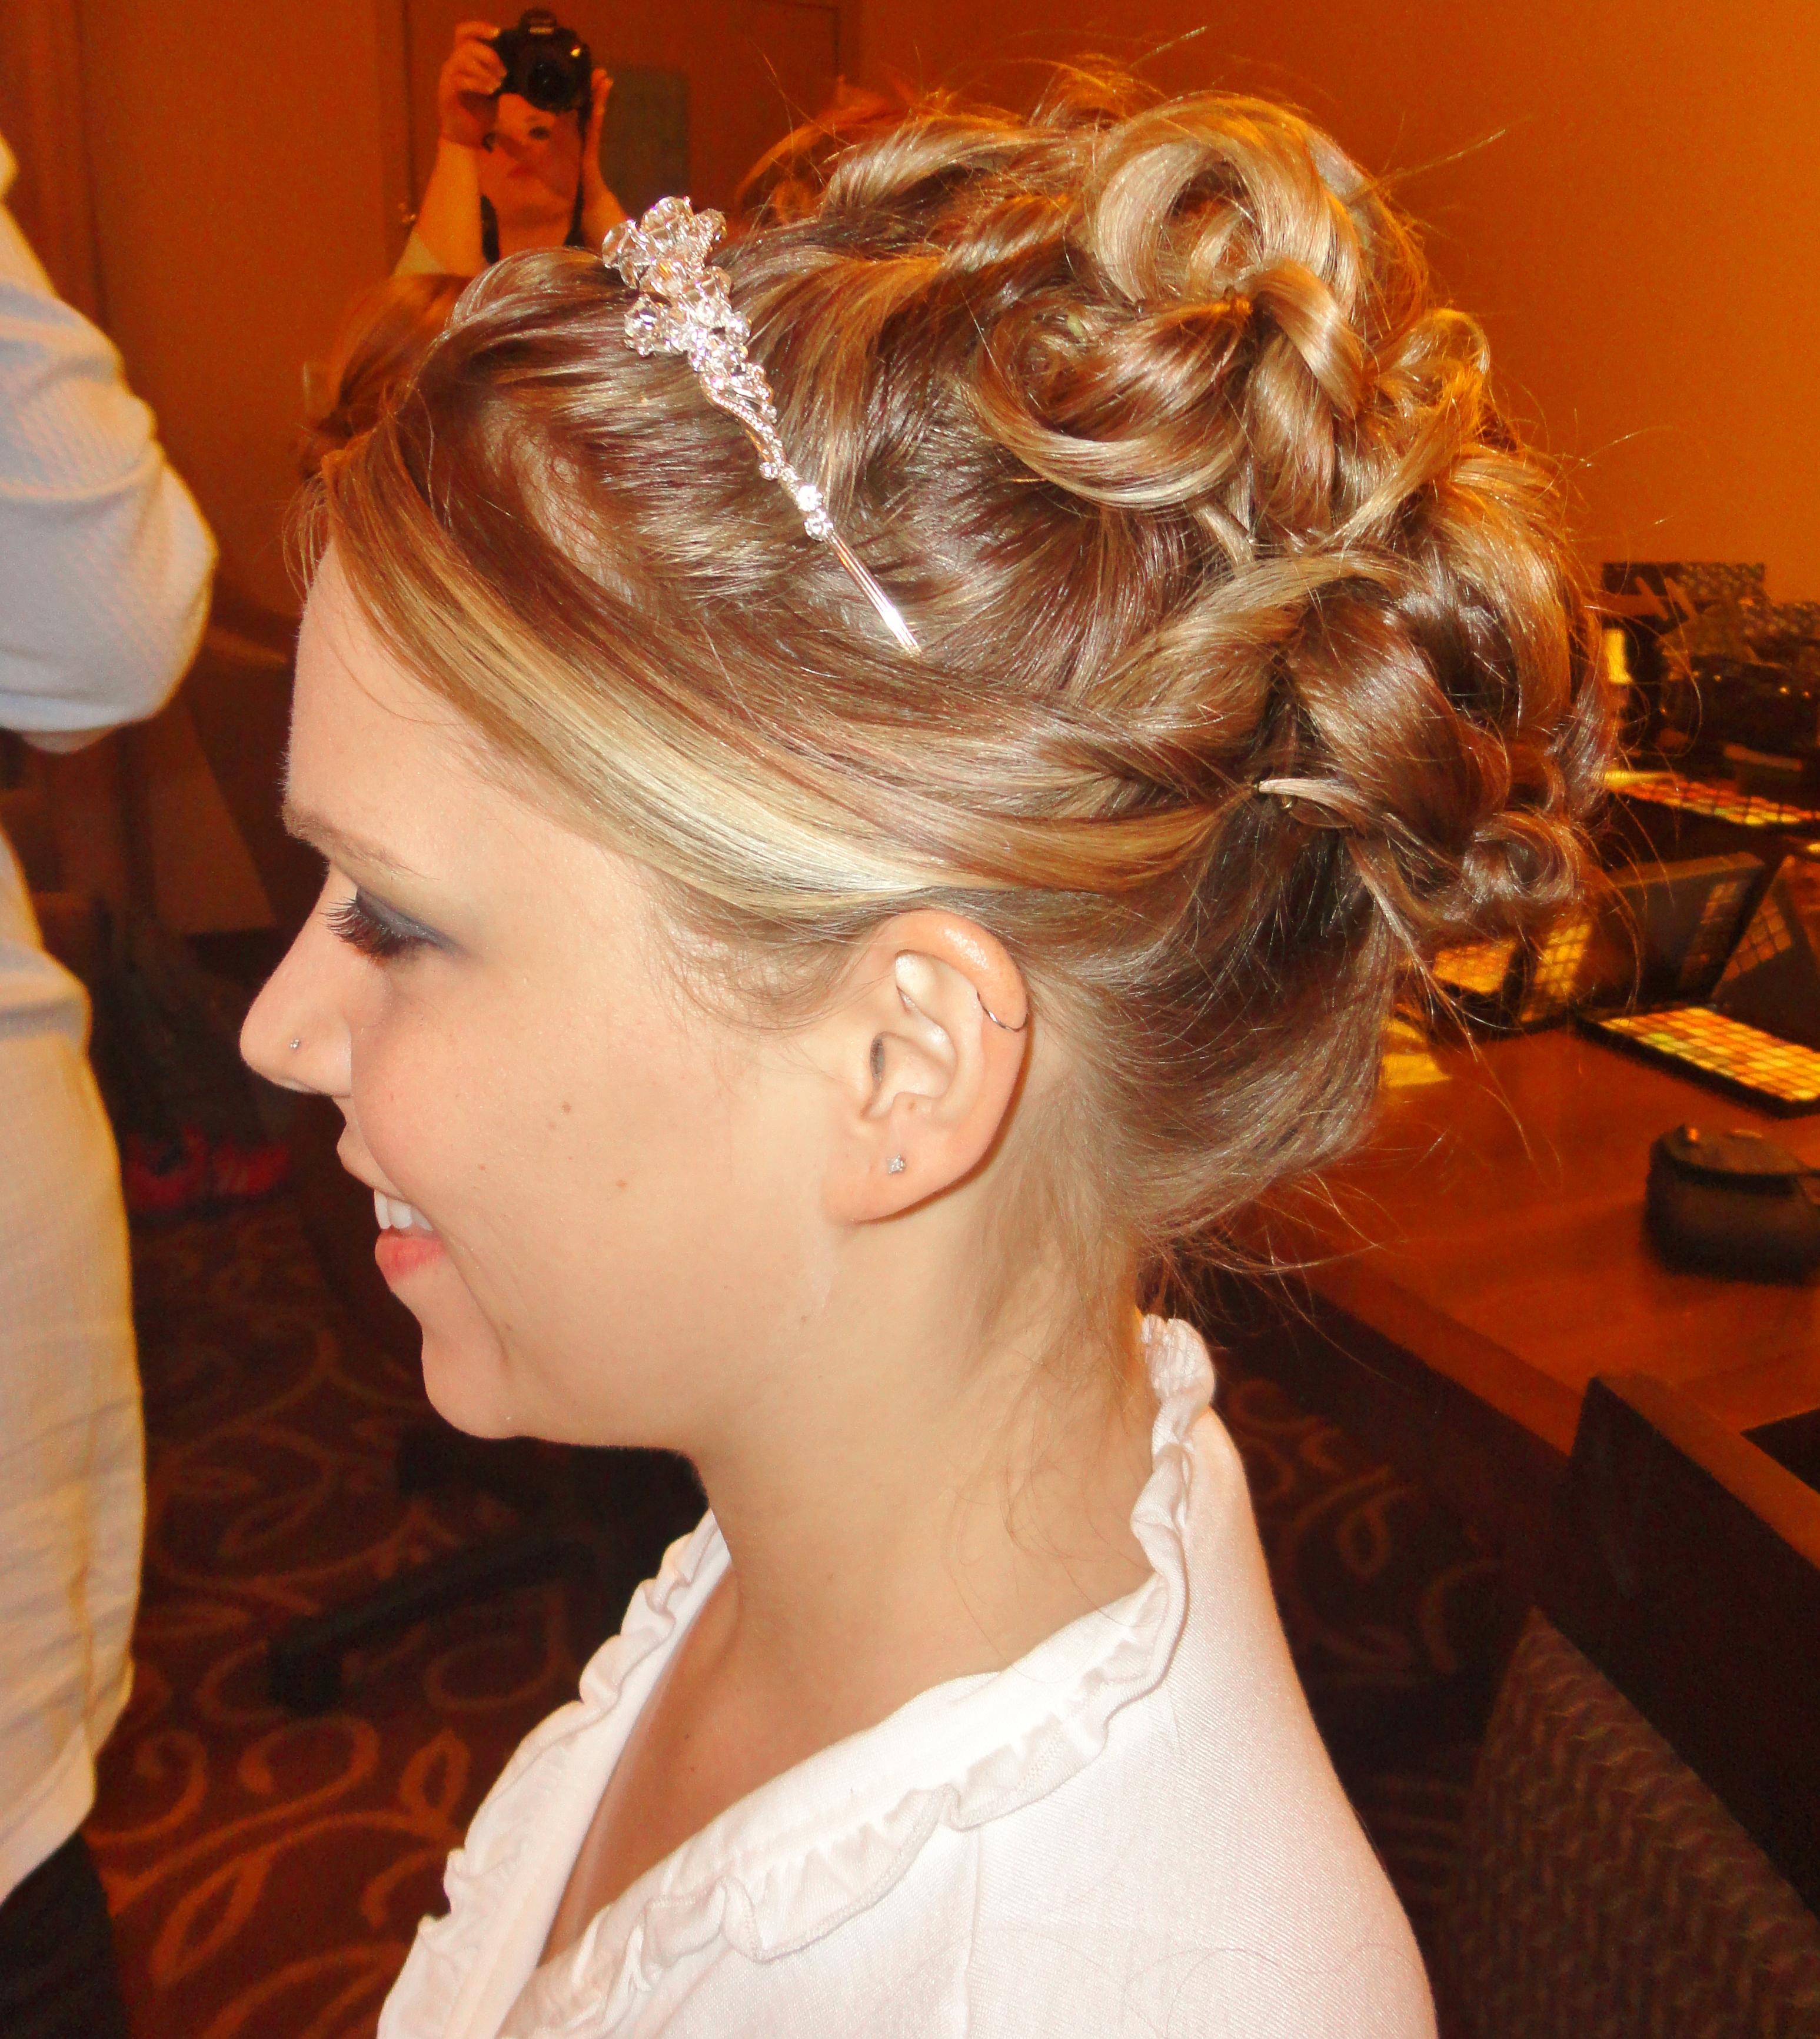 Pittsburgh Hair Stylist